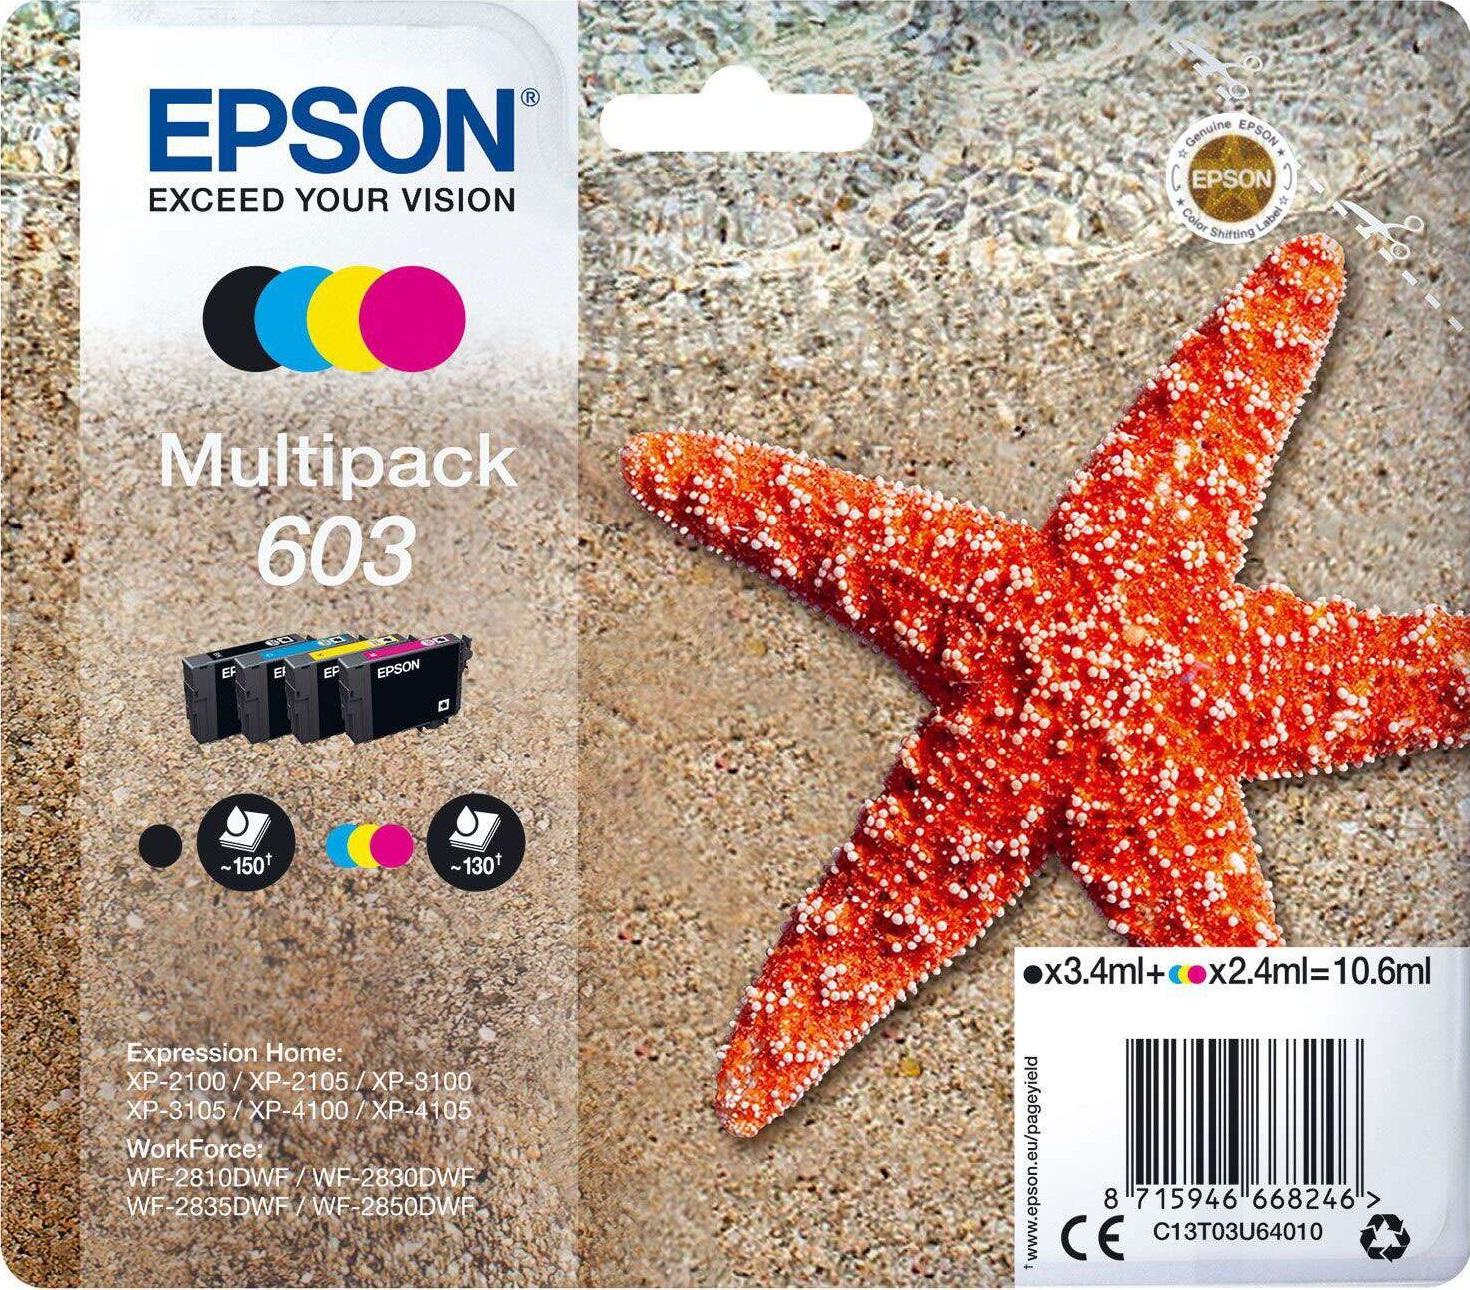 Epson 603 Original 4 Colour Ink Cartridge Multipack